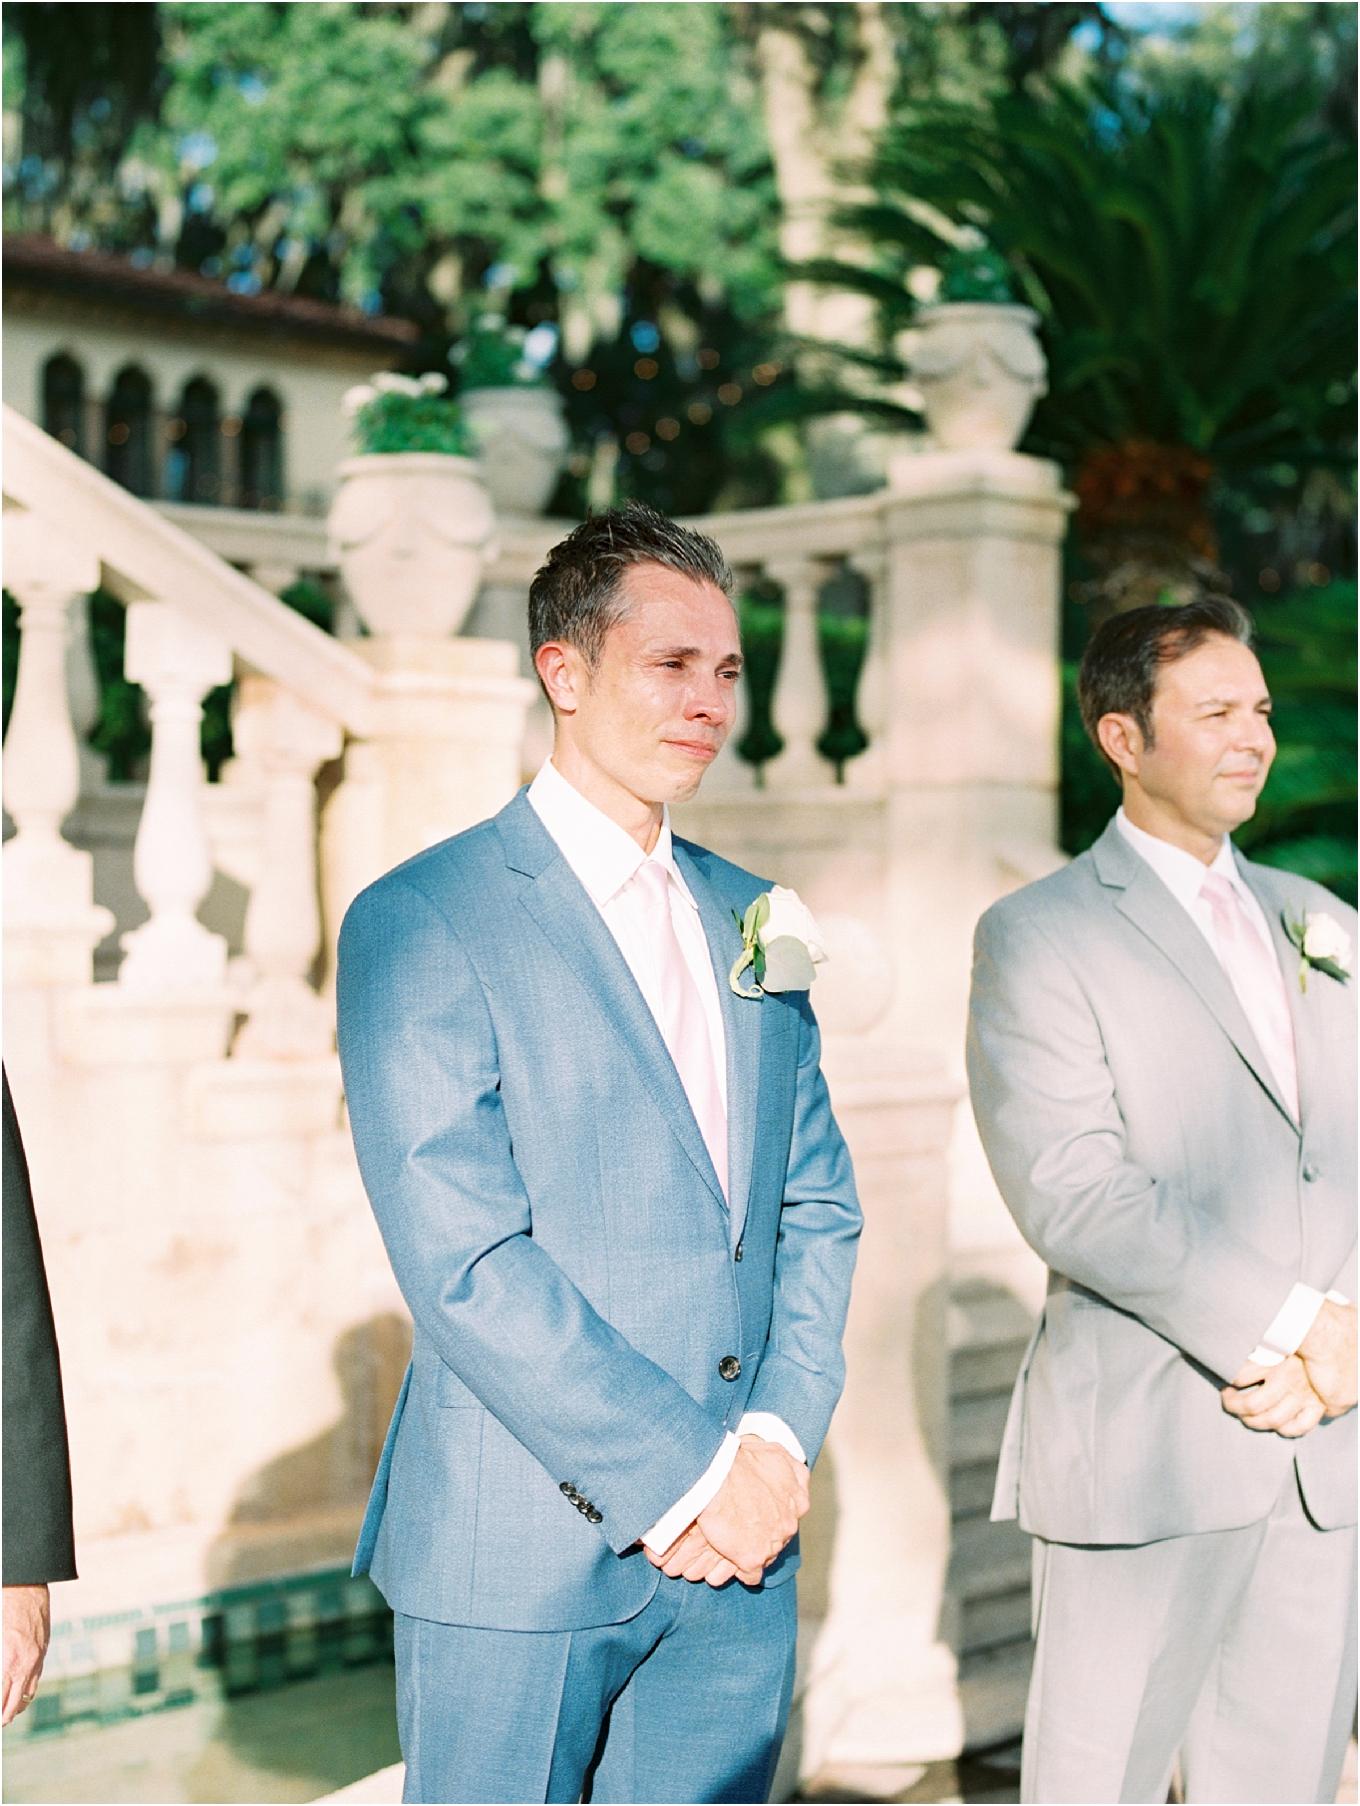 Lisa Silva Photography- Ponte Vedra Beach, St. Augustine and Jacksonville, Florida Fine Art Film Wedding and Boudoir Photography- Elegant Blush  Wedding at Epping Forest Yacht Club in Jacksonville, Florida_0048.jpg